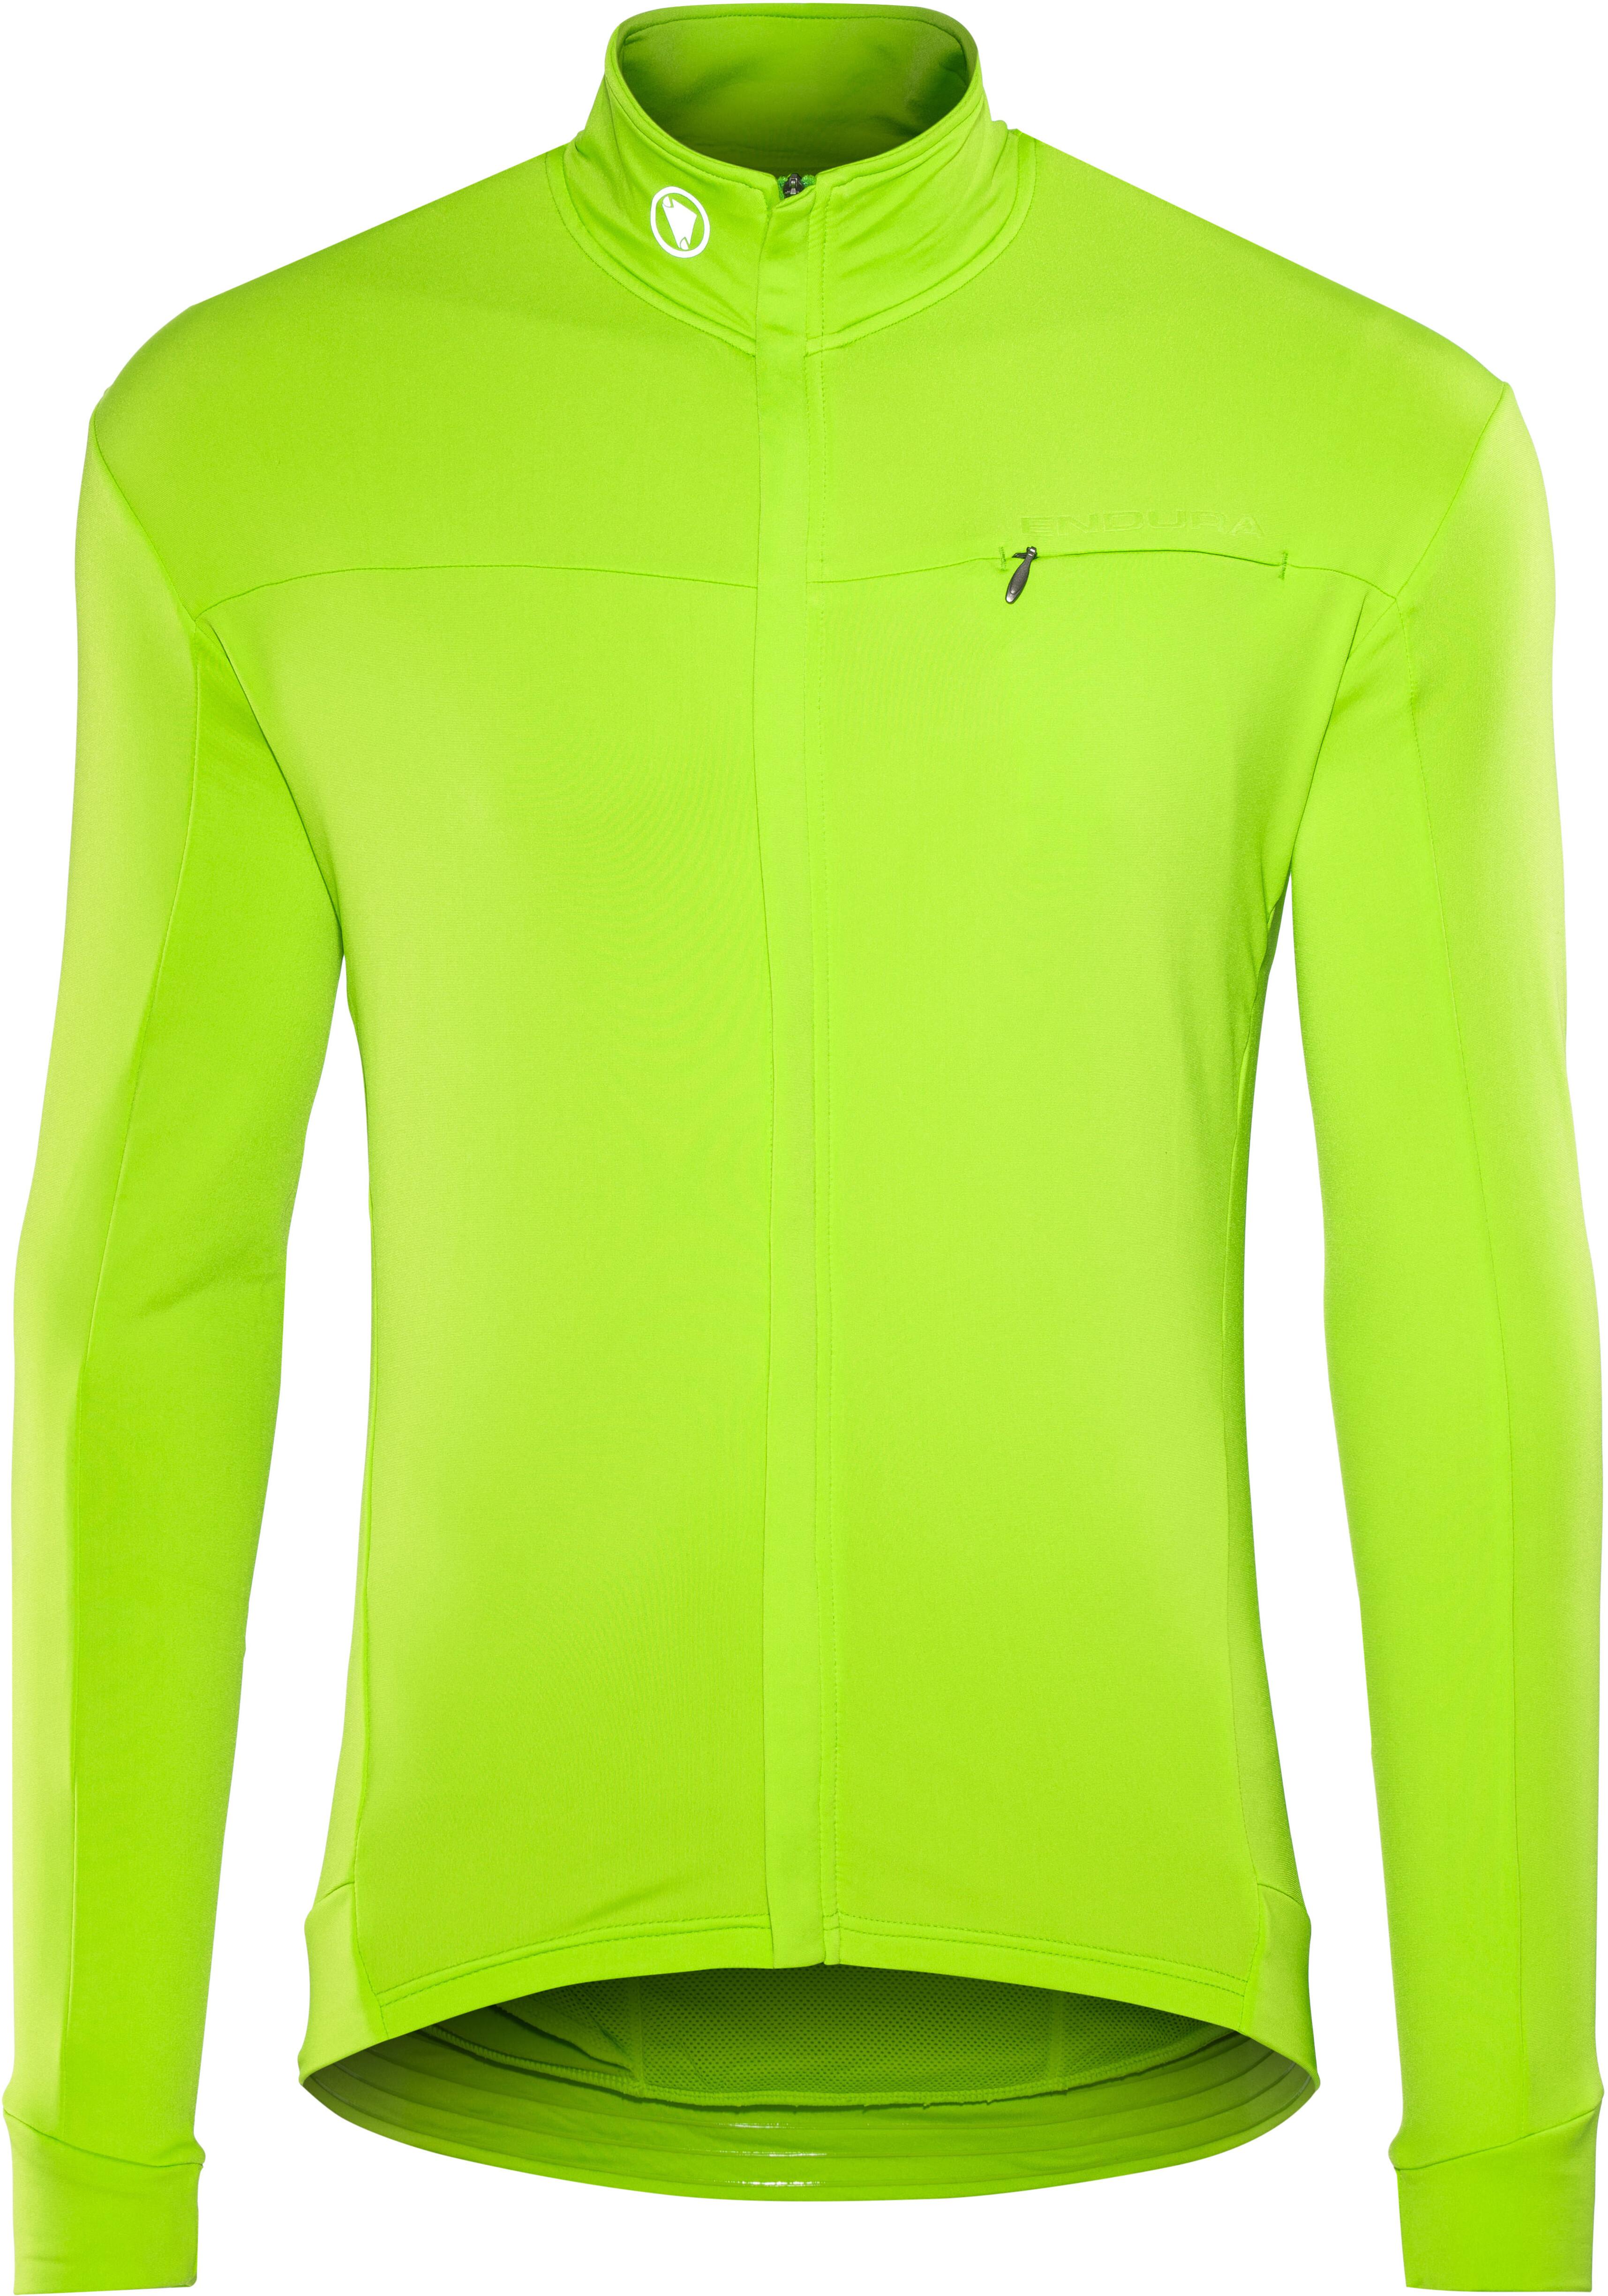 Endura Xtract Roubaix Bike Jersey Longsleeve Men green at Bikester.co.uk e6ba7156d